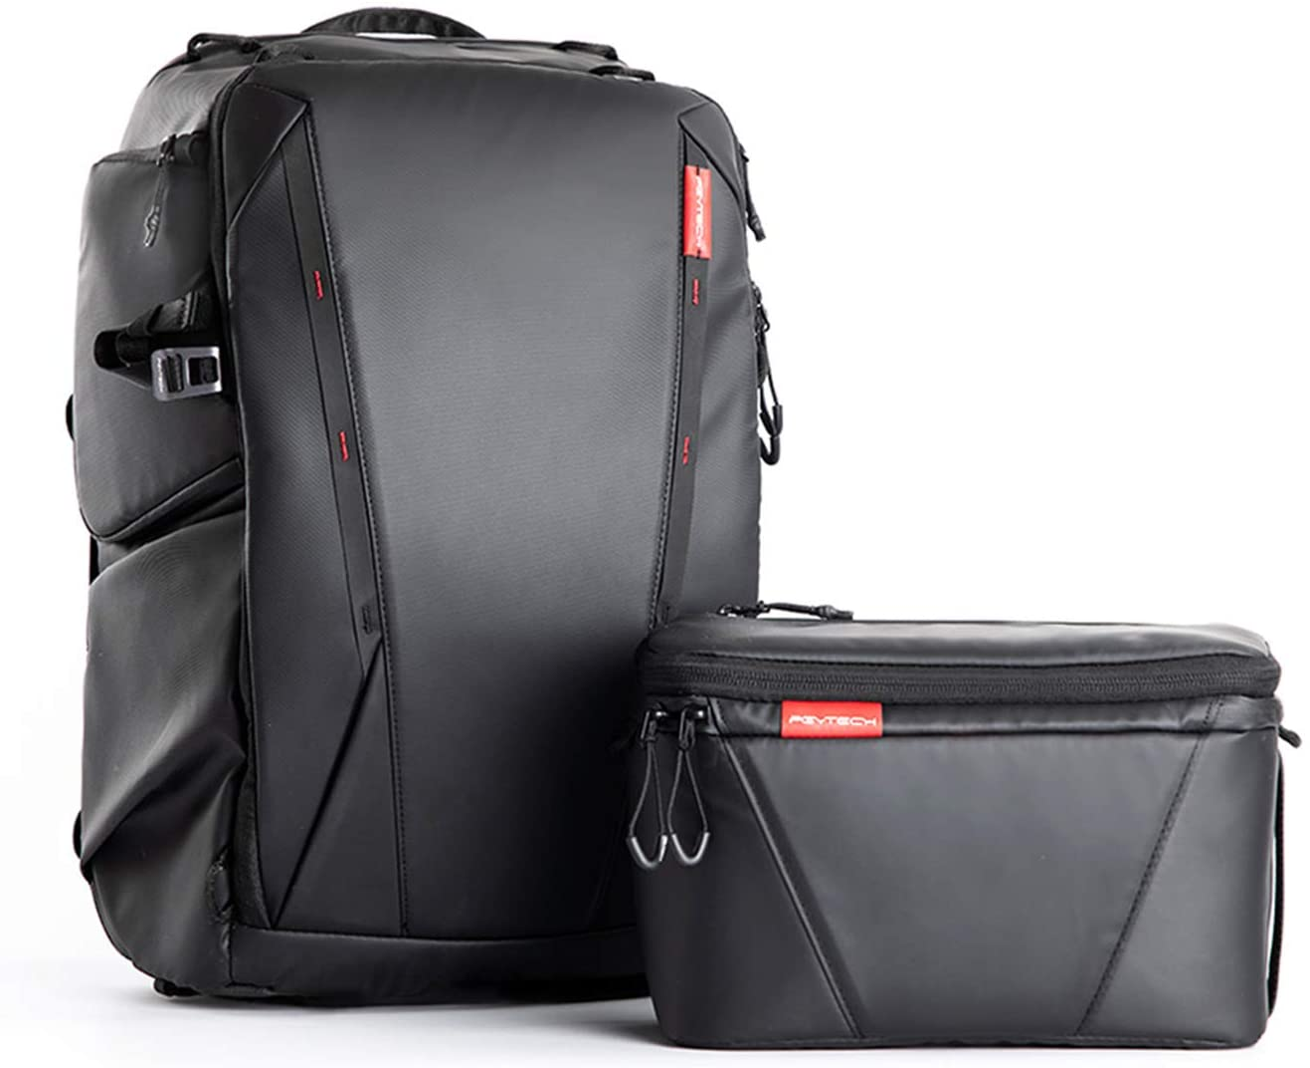 PGYTECH OneMo Camera Backpack 25L with Shoulder Bag for Sony 200-600mm Lens, Canon, Nikon, Drone, DJI OSMO Action/Pocket/OM 4, Mavic Air 2/Mini/2, DSLR/SLR Mirrorless, Camera Tripod (Twilight Black)